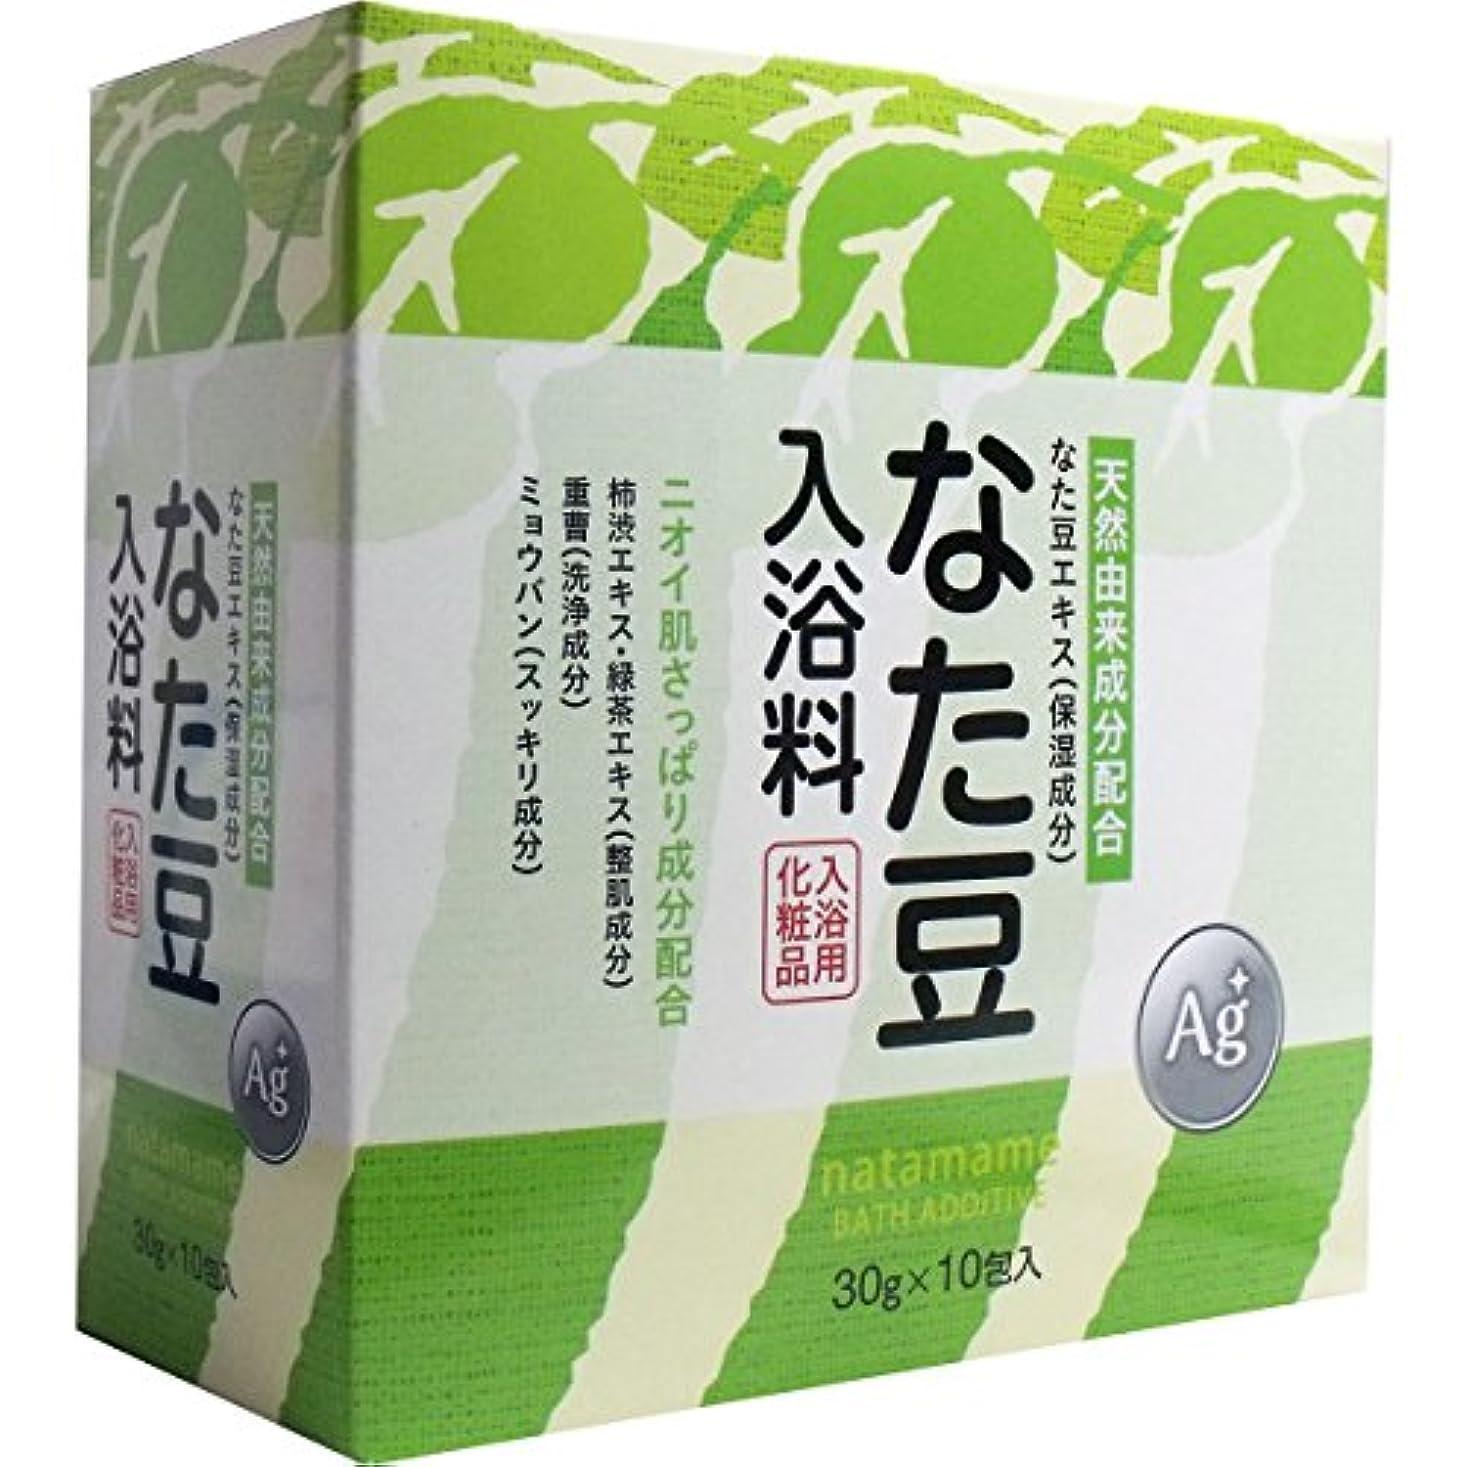 バット昼間忠誠天然由来成分配合 なた豆入浴料 入浴用化粧品 30g×10包入